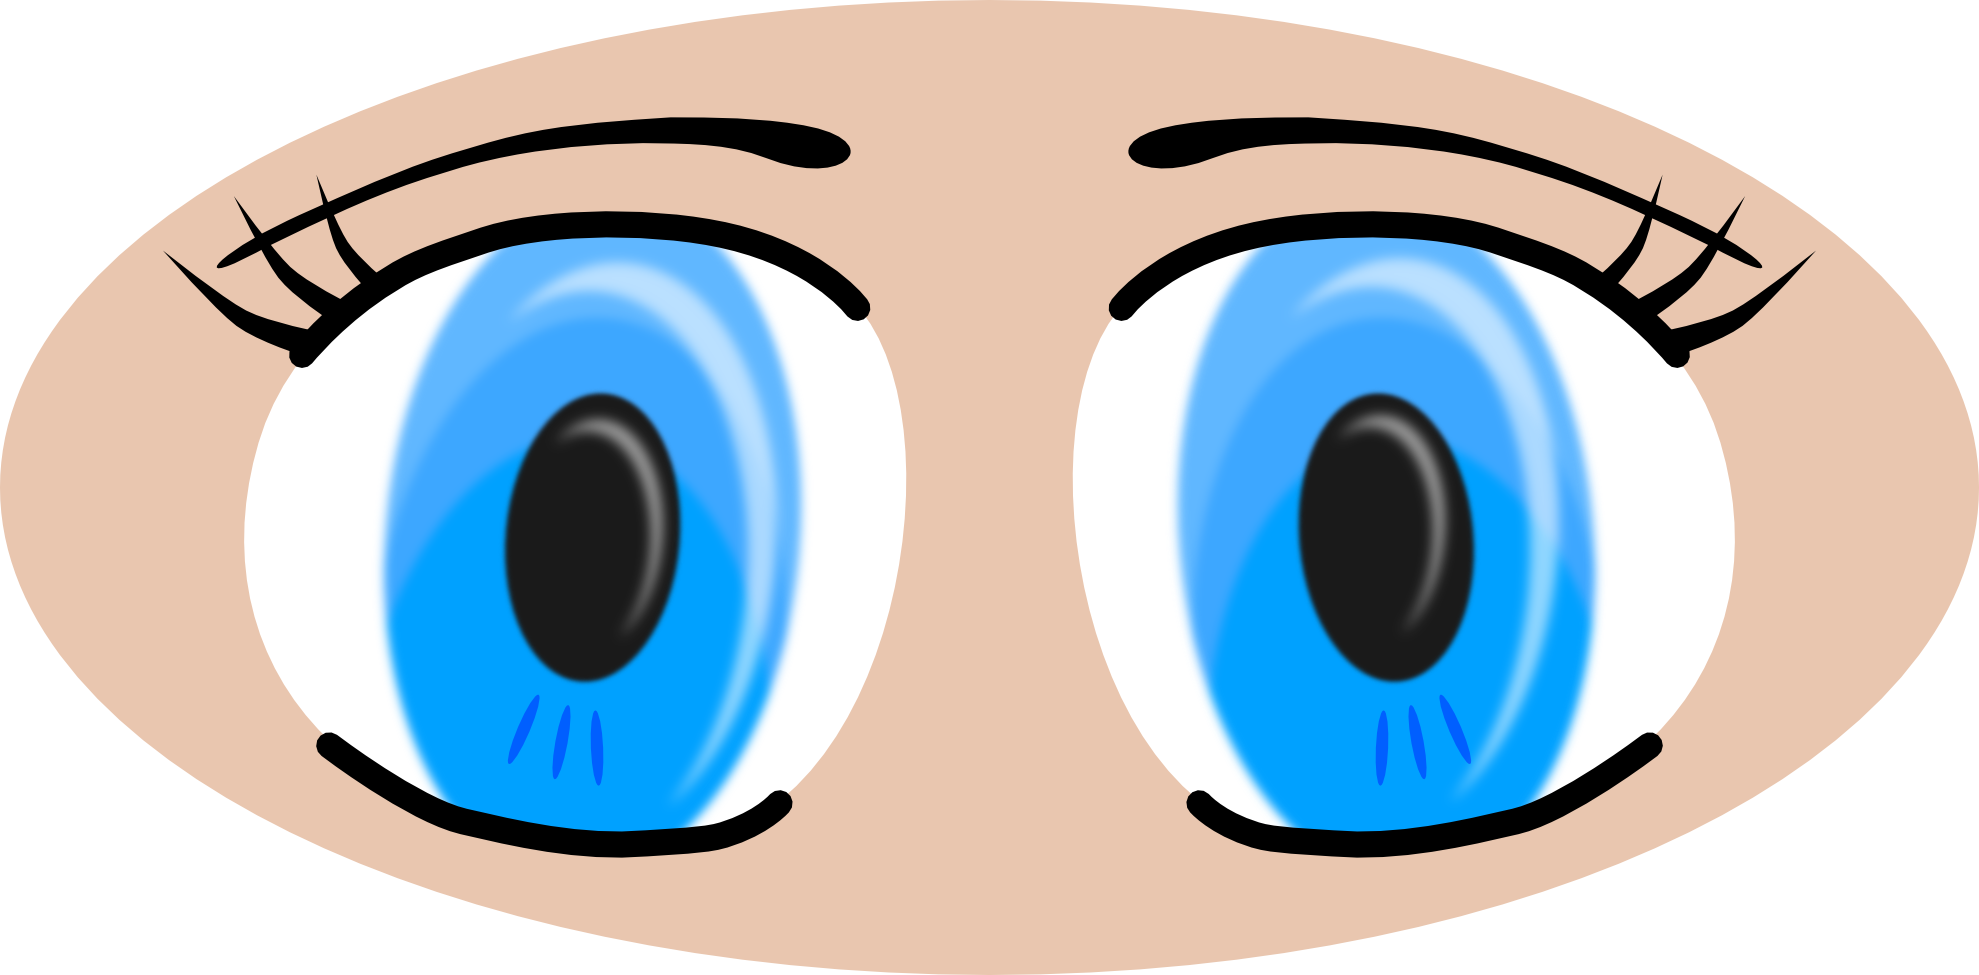 Eyes Eye Clipart 1 Image-Eyes eye clipart 1 image-14